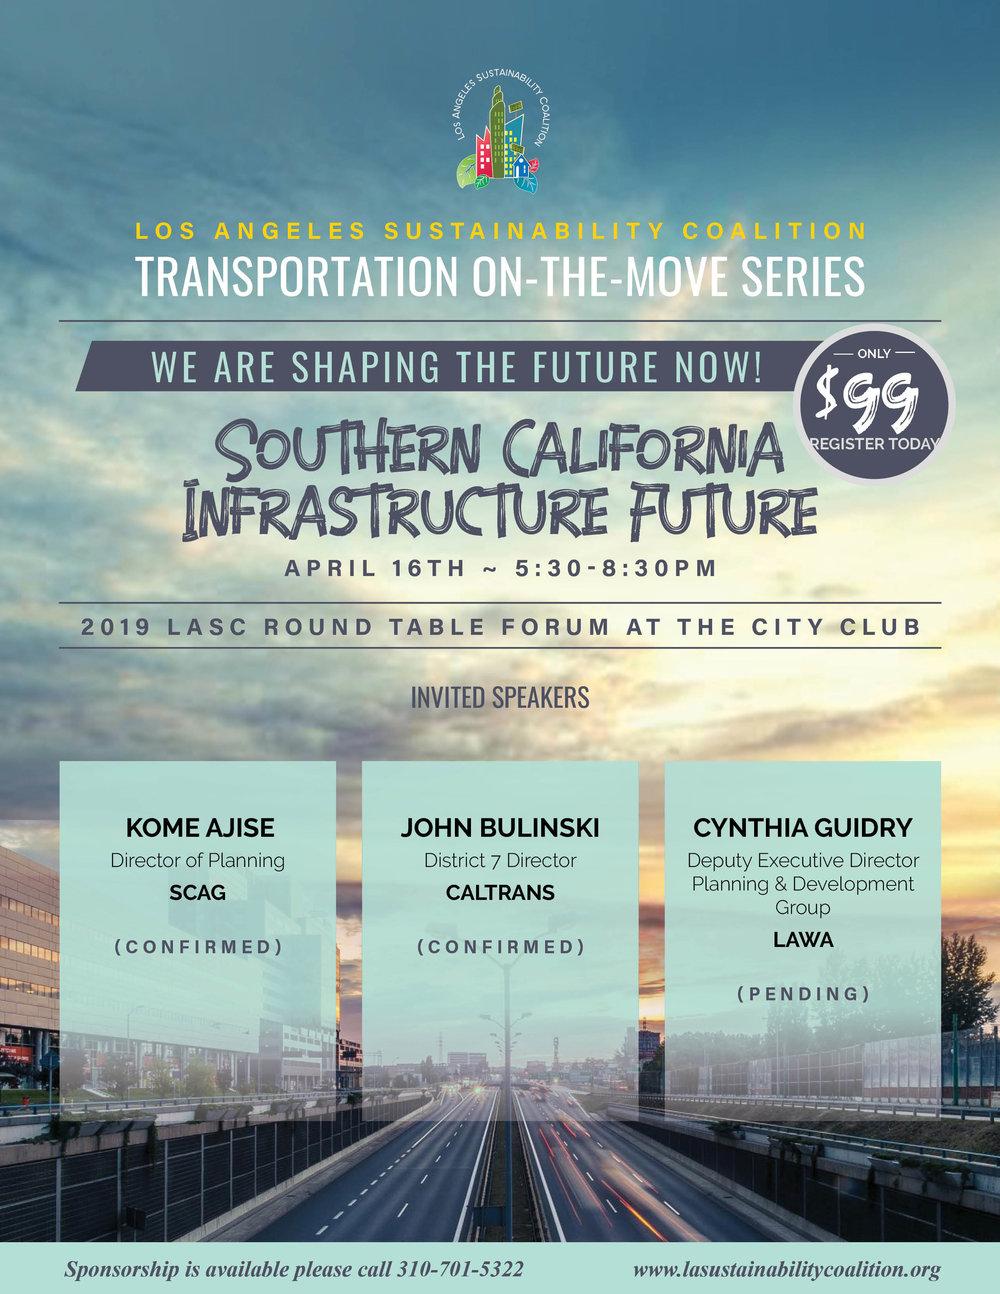 041619 - TOM - SoCal Infrastructure Future.jpg